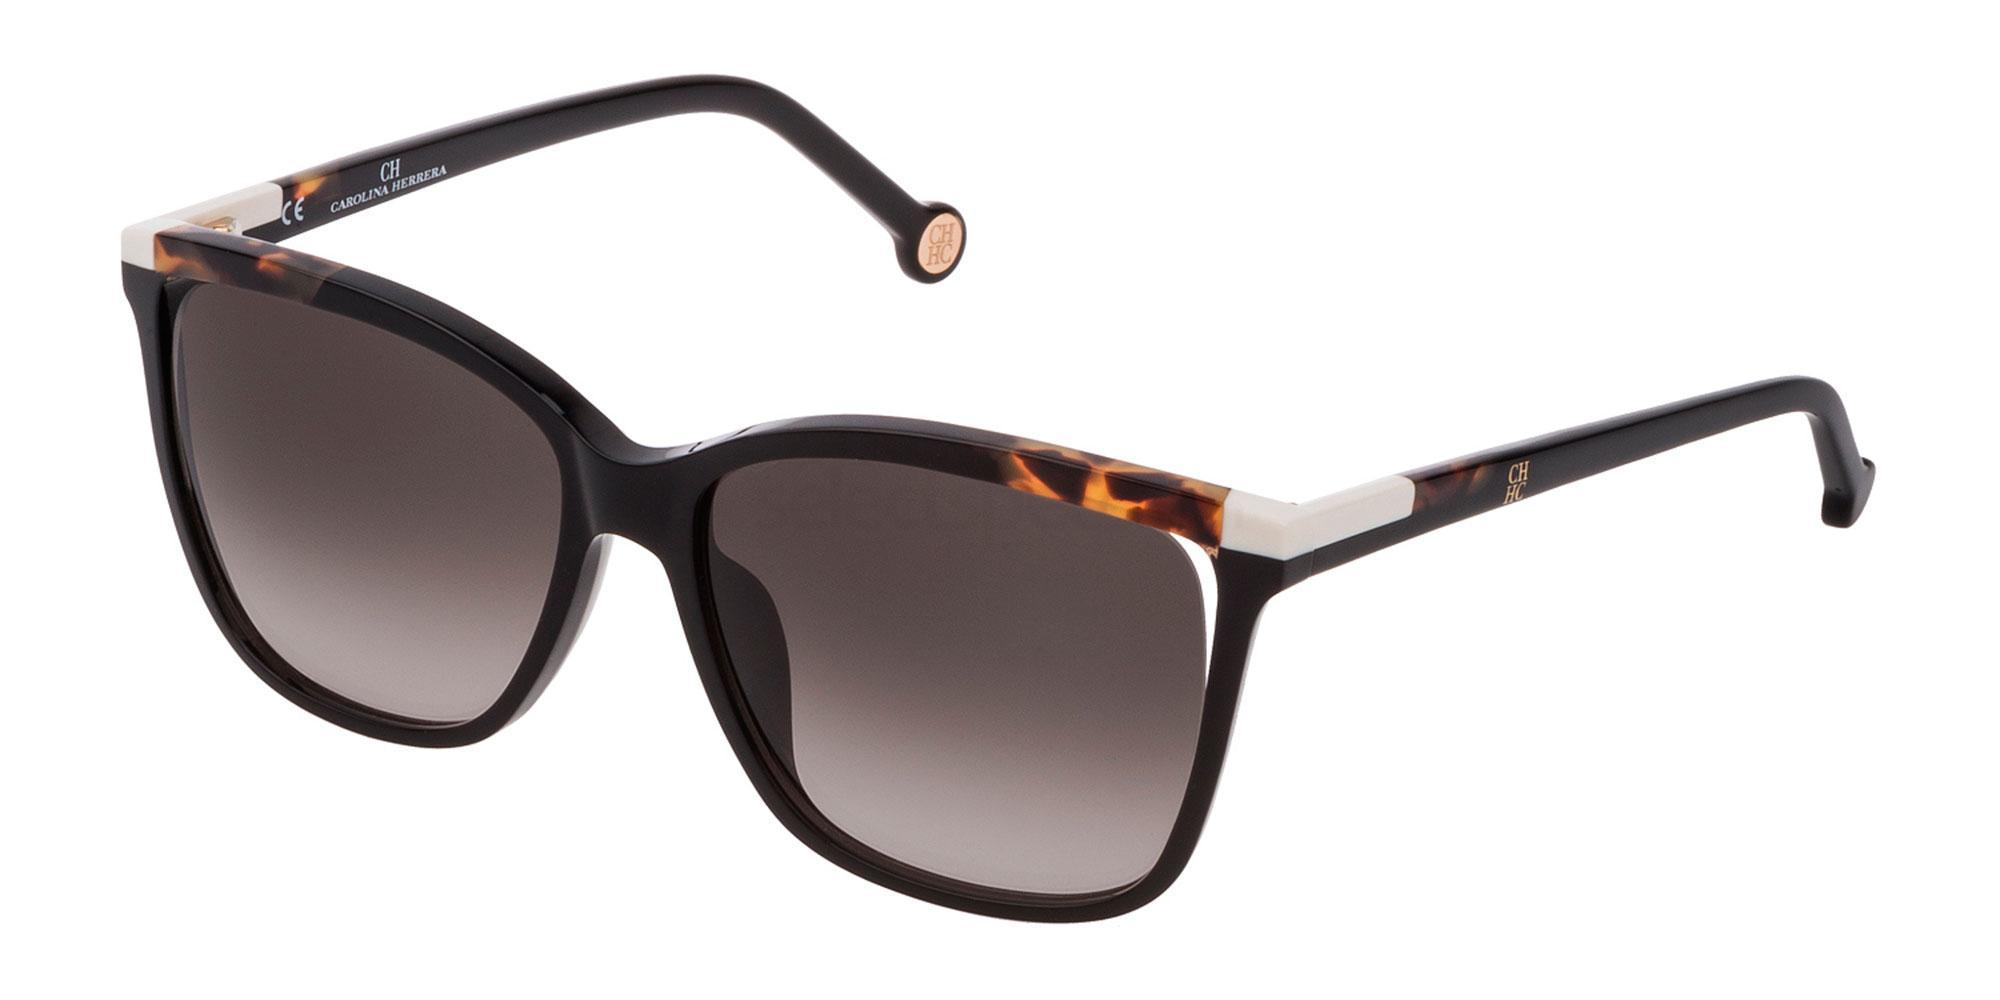 0700 SHE821 Sunglasses, CH Carolina Herrera